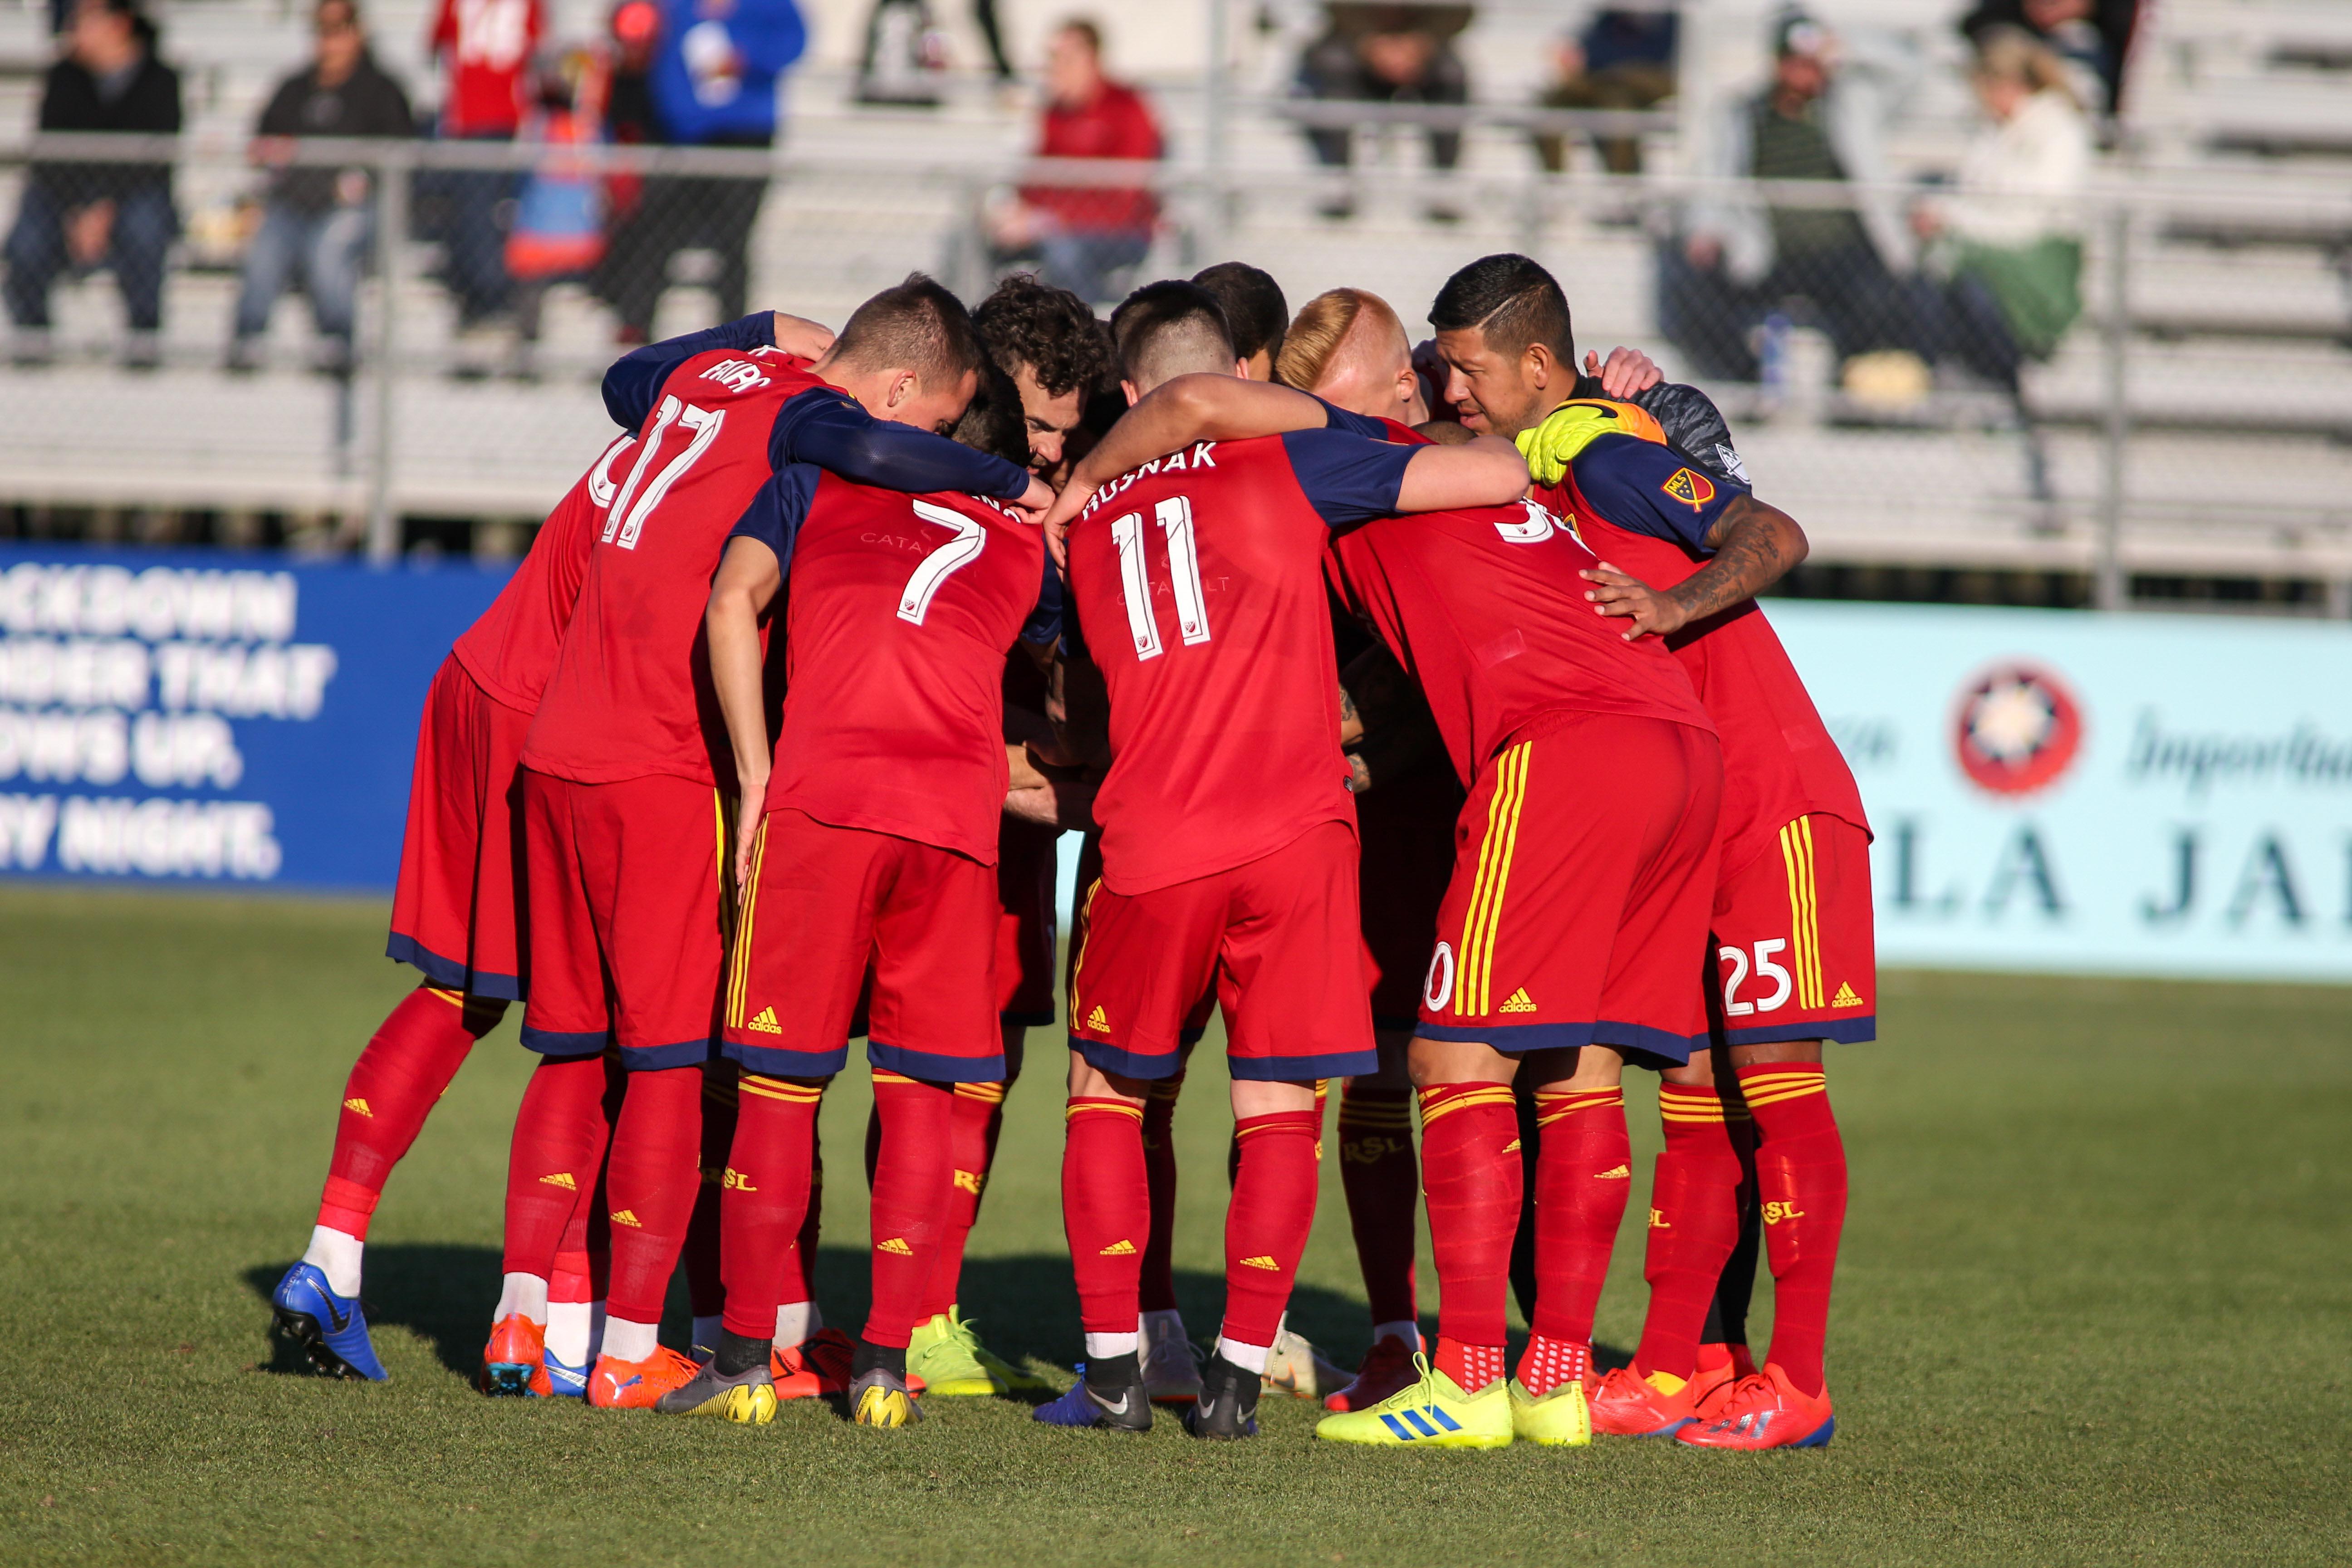 MLS: Mobile Mini Sun Cup-Portland Timbers at Real Salt Lake